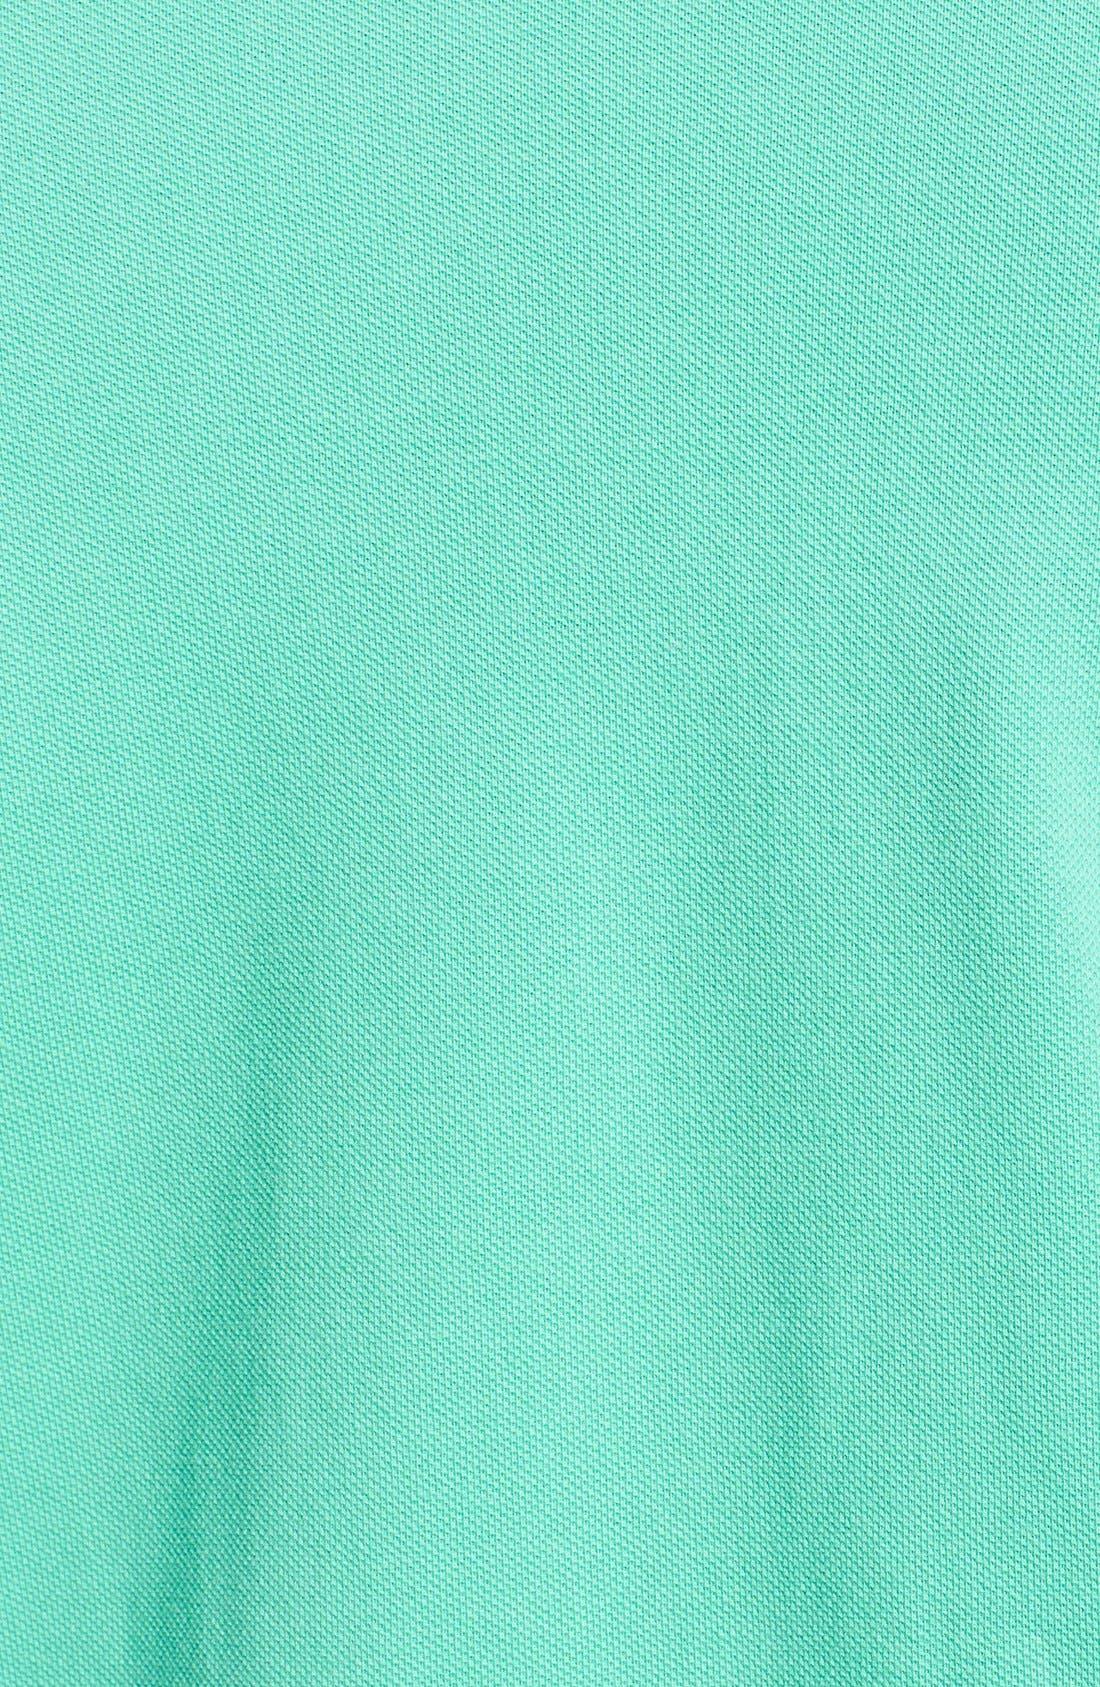 Alternate Image 3  - Vineyard Vines 'Classic' Piqué Knit Polo